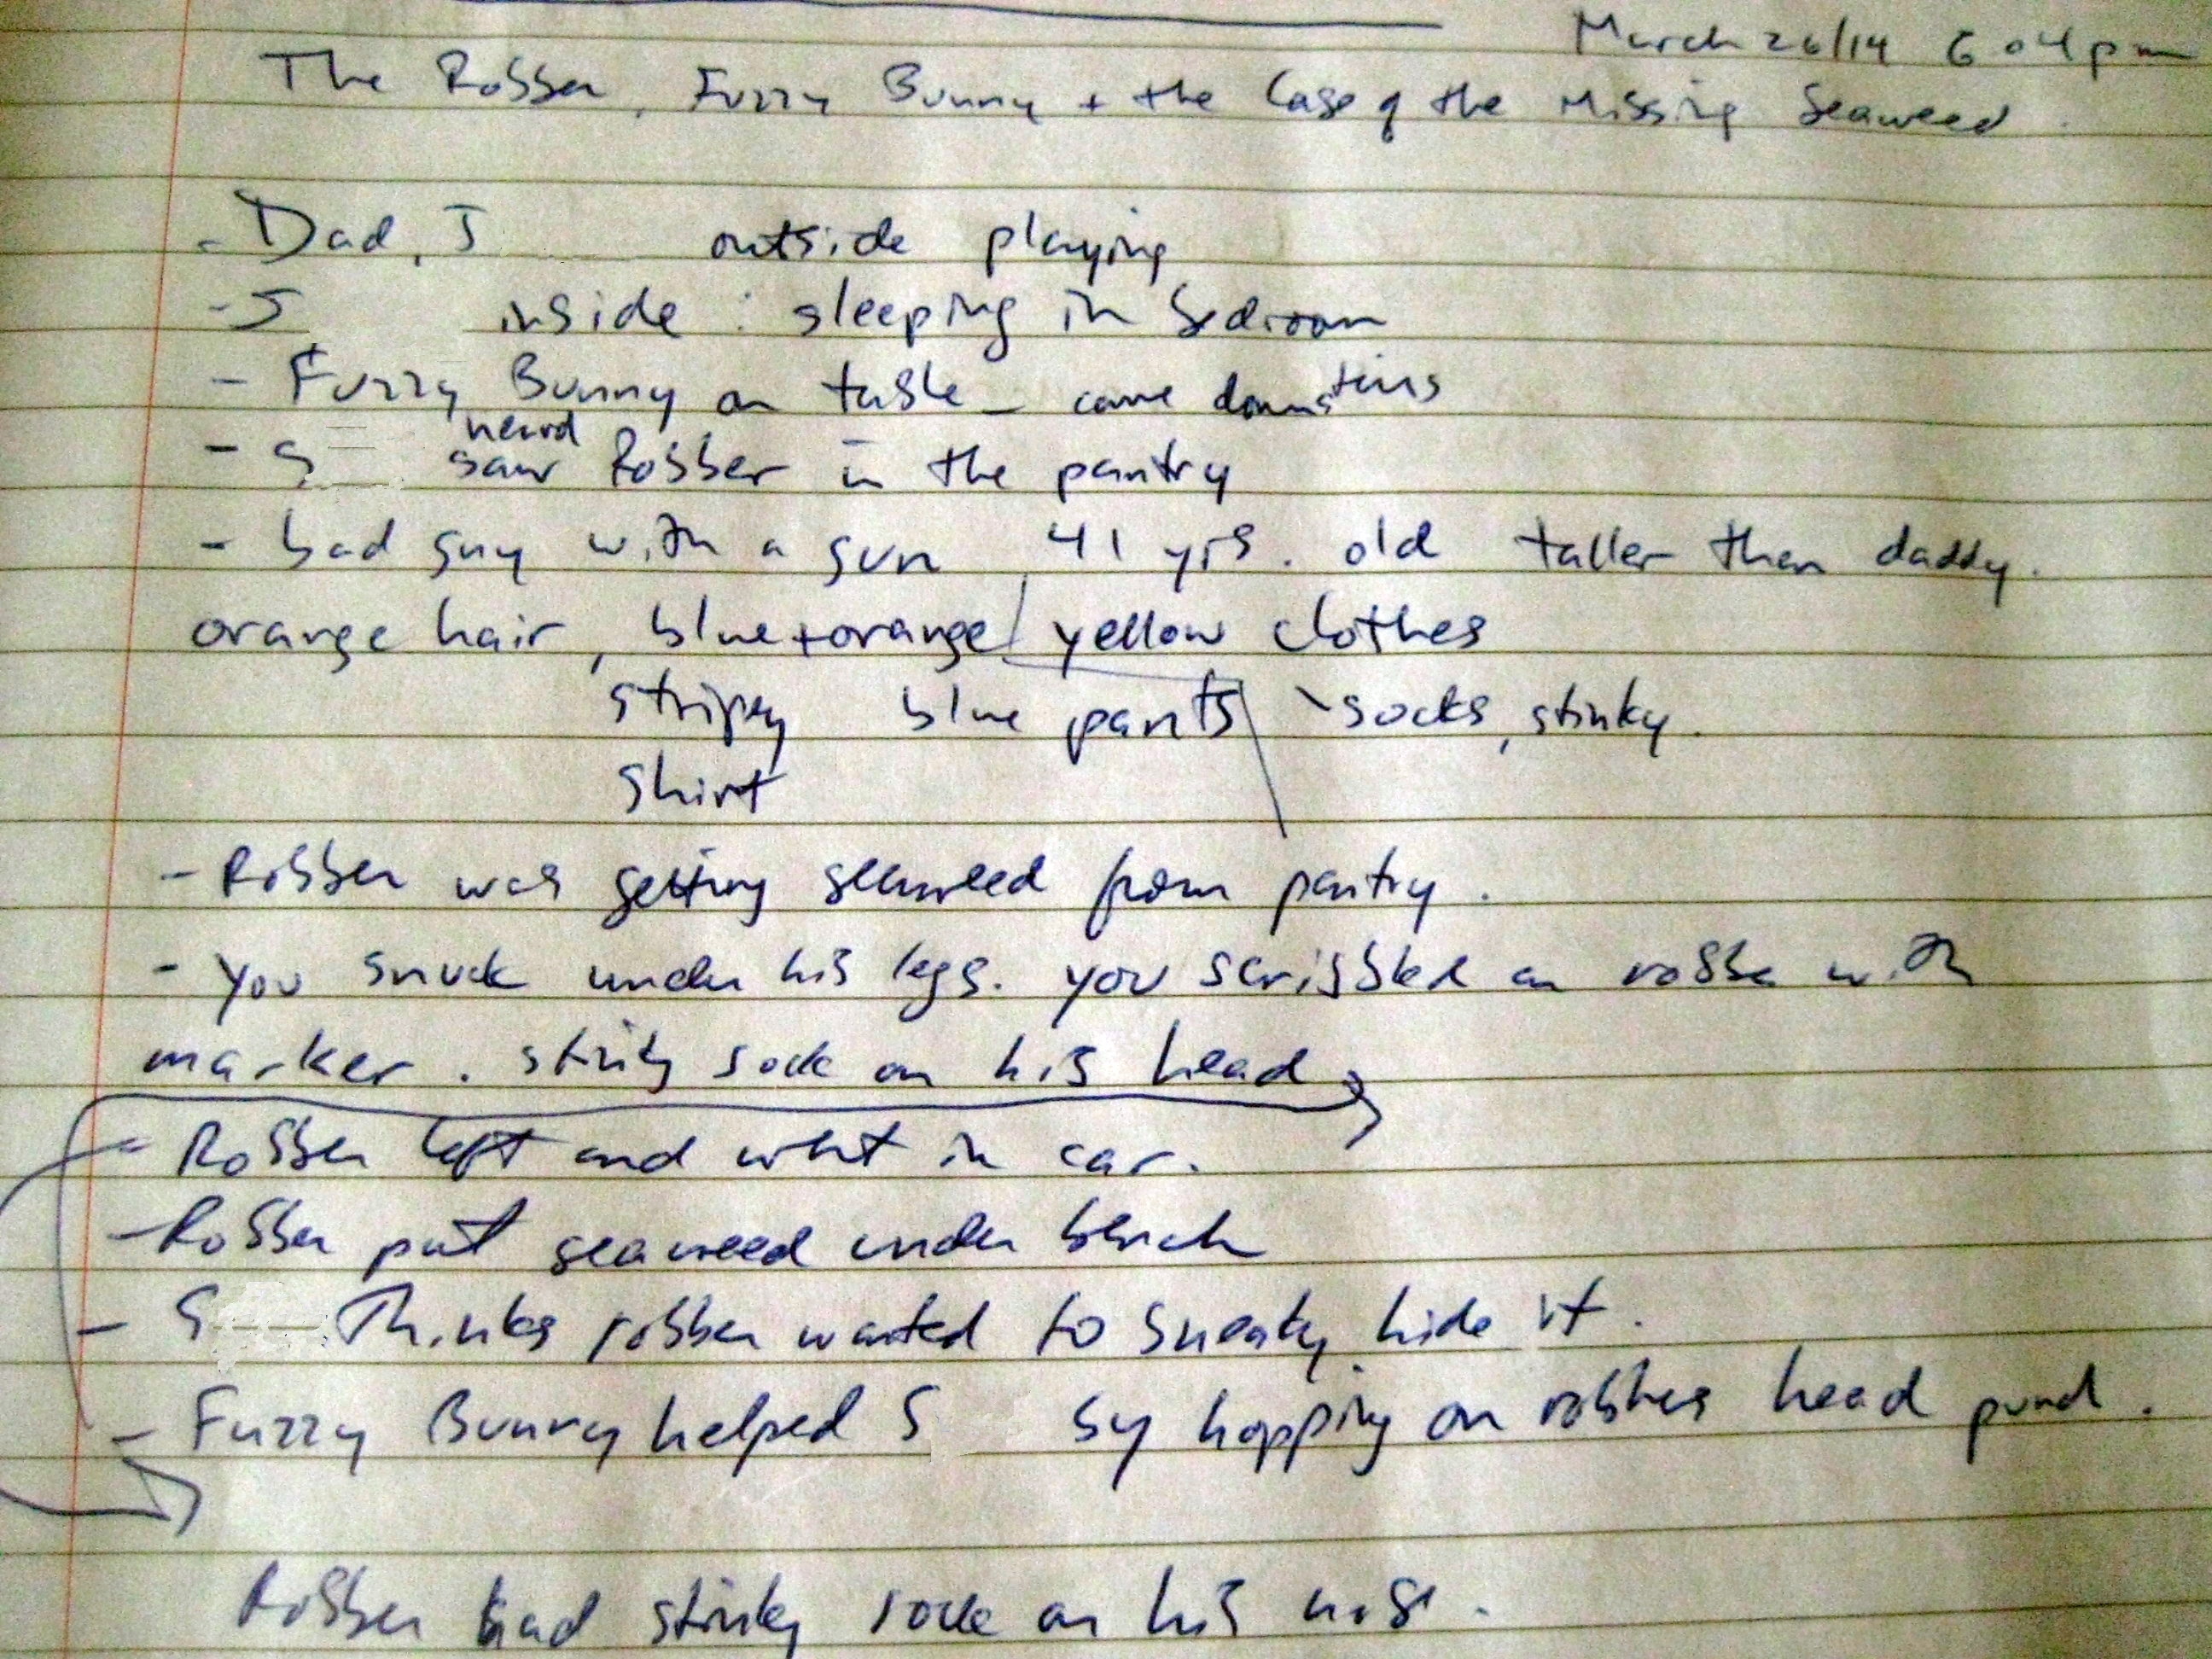 Draft story outline